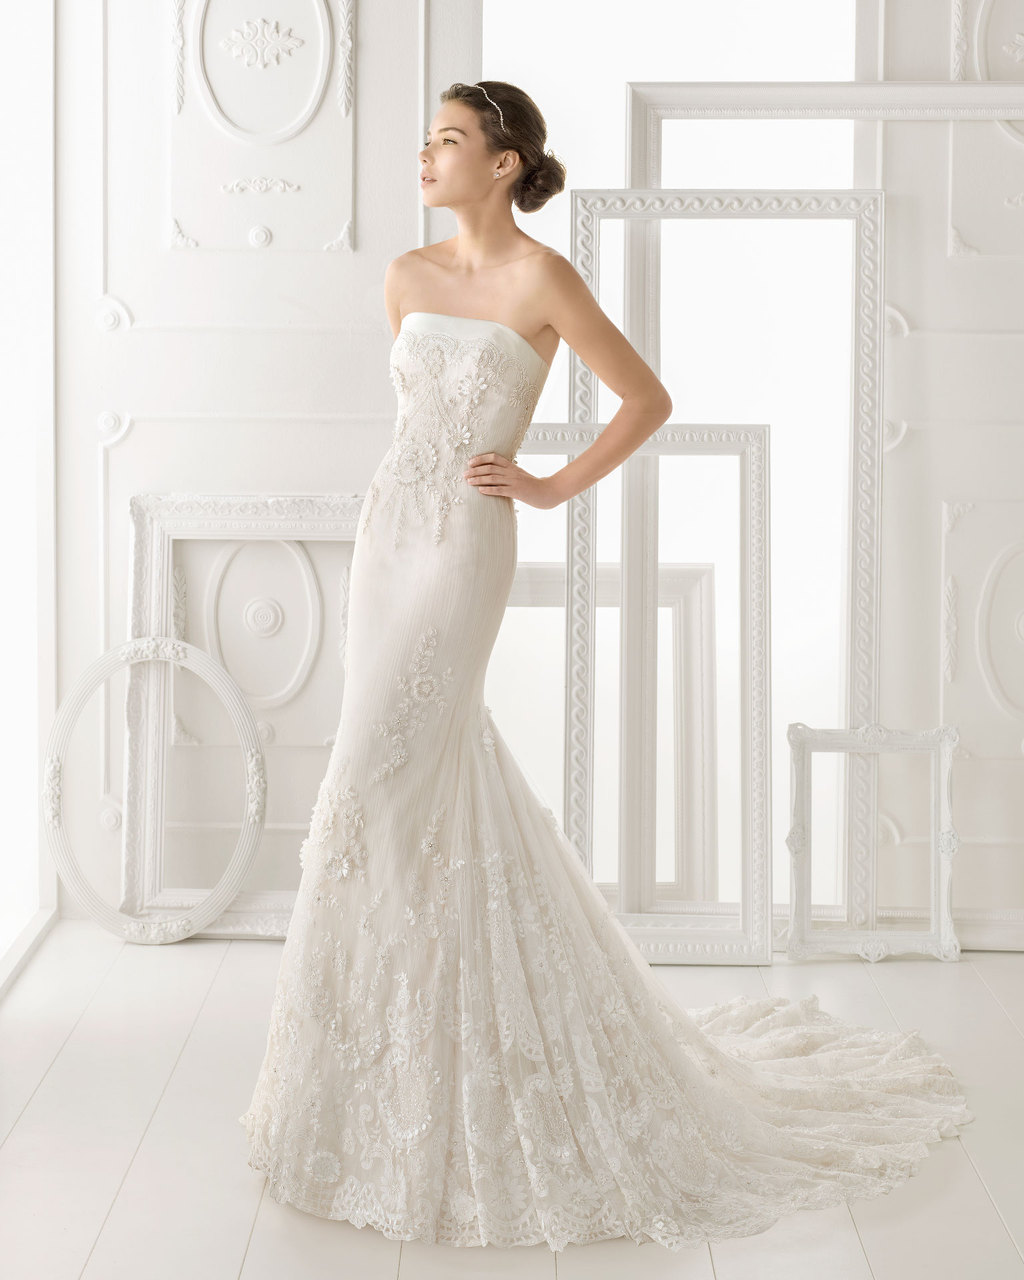 Aire-barcelona-wedding-dress-2014-bridal-osnel.full